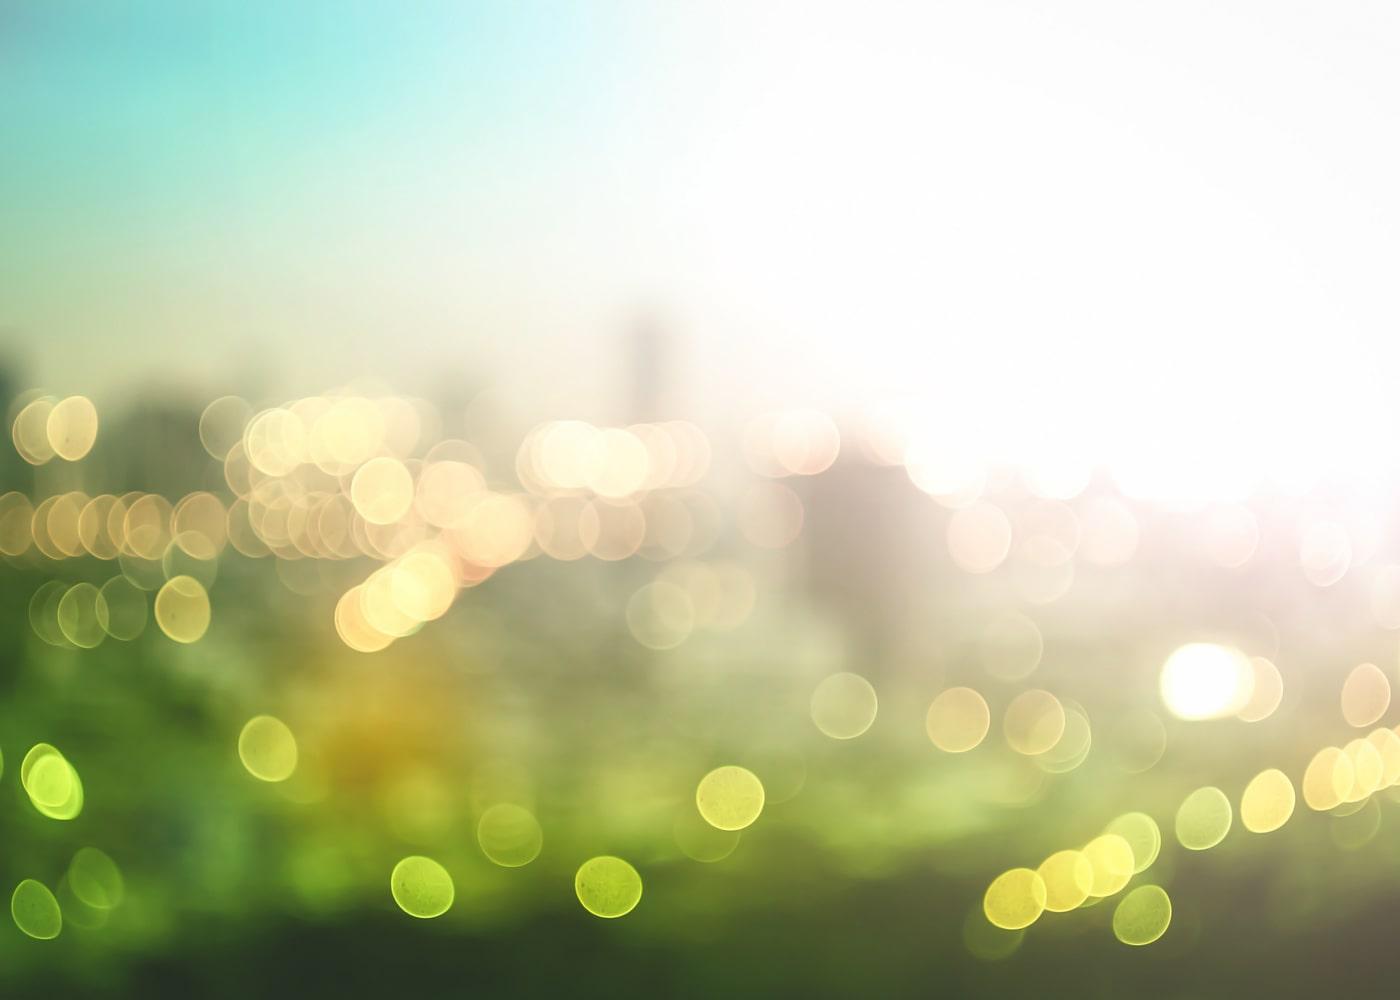 naem-2018-blog-world-environment-day-concept-abstract-blur-700x500